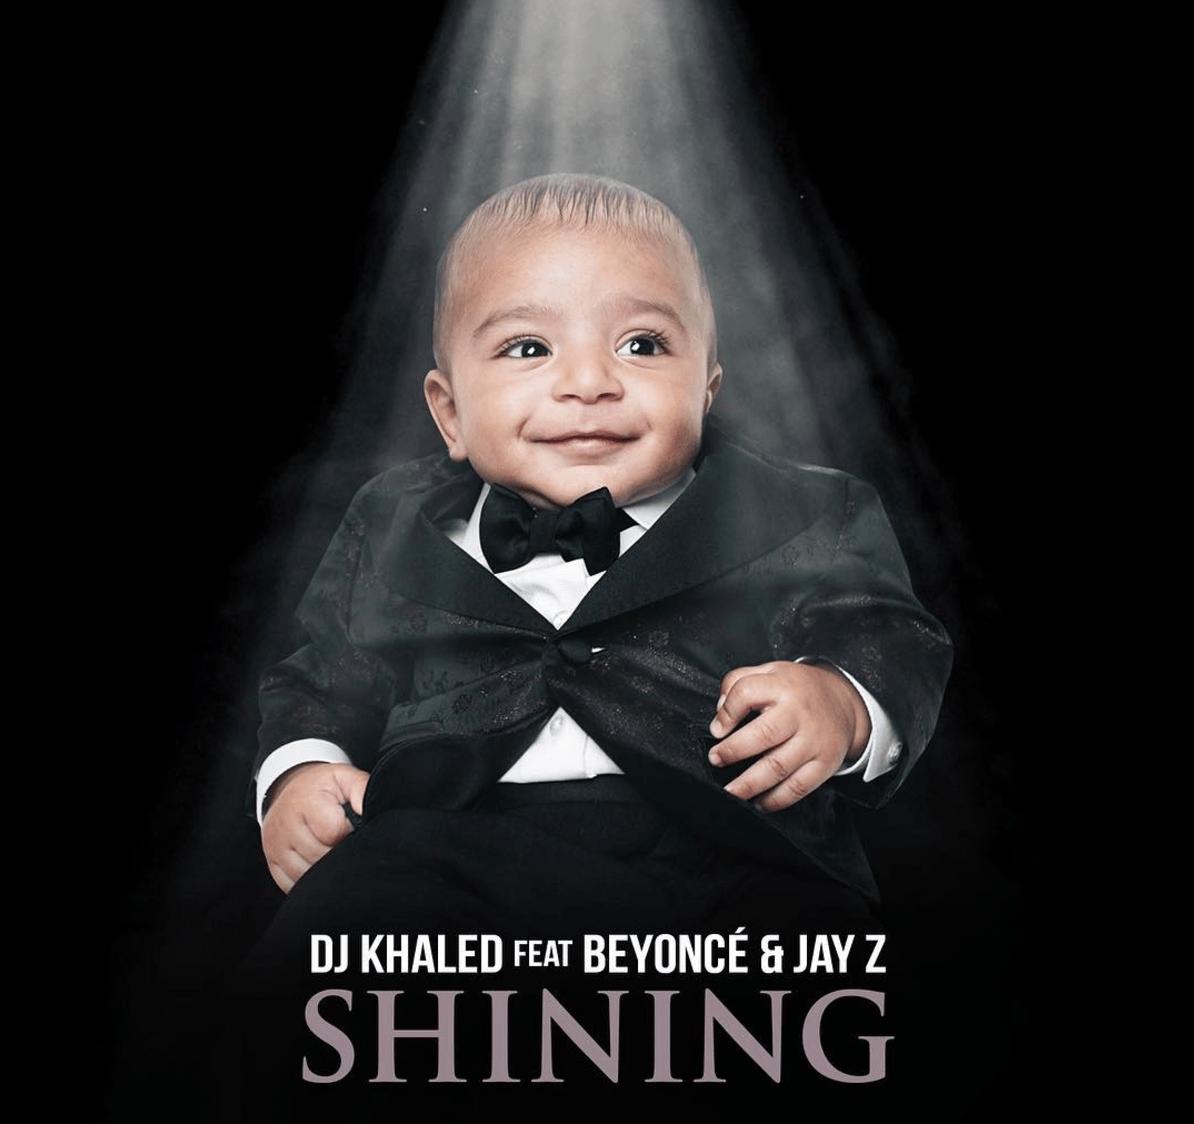 DJ Khaled s'offre un gros feat. avec Shining (feat. Jay Z & Beyoncé)